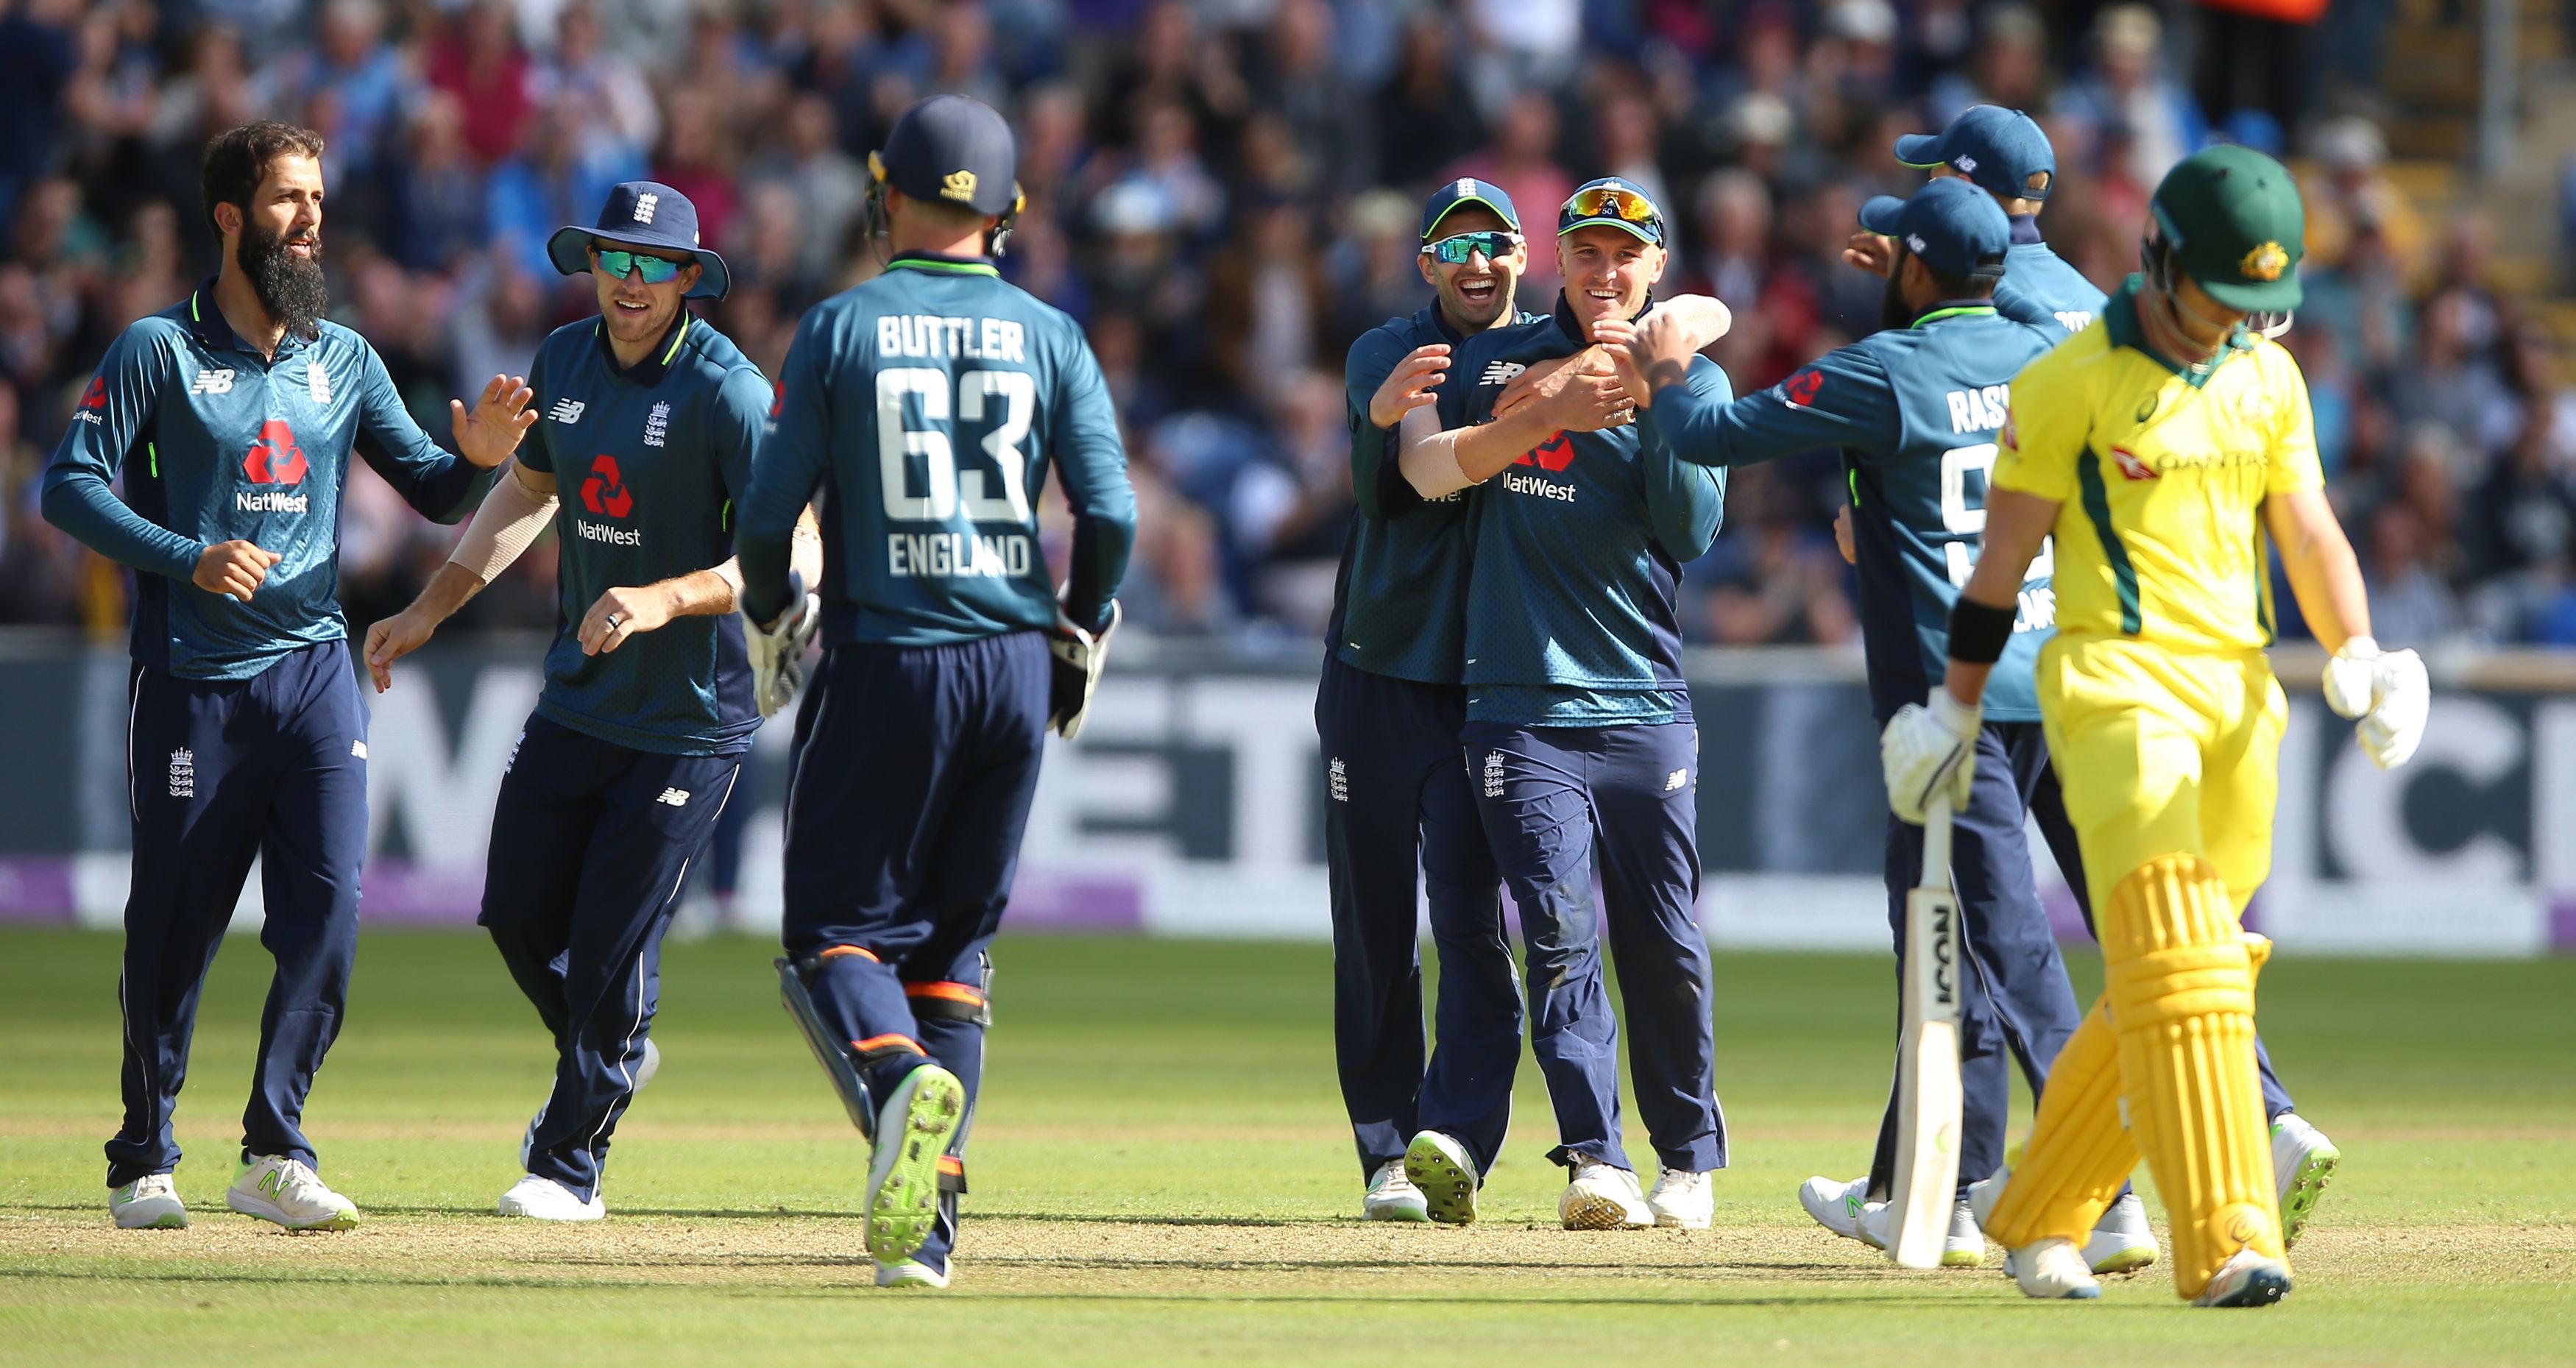 England swept aside Australia to move into a 2-0 series lead